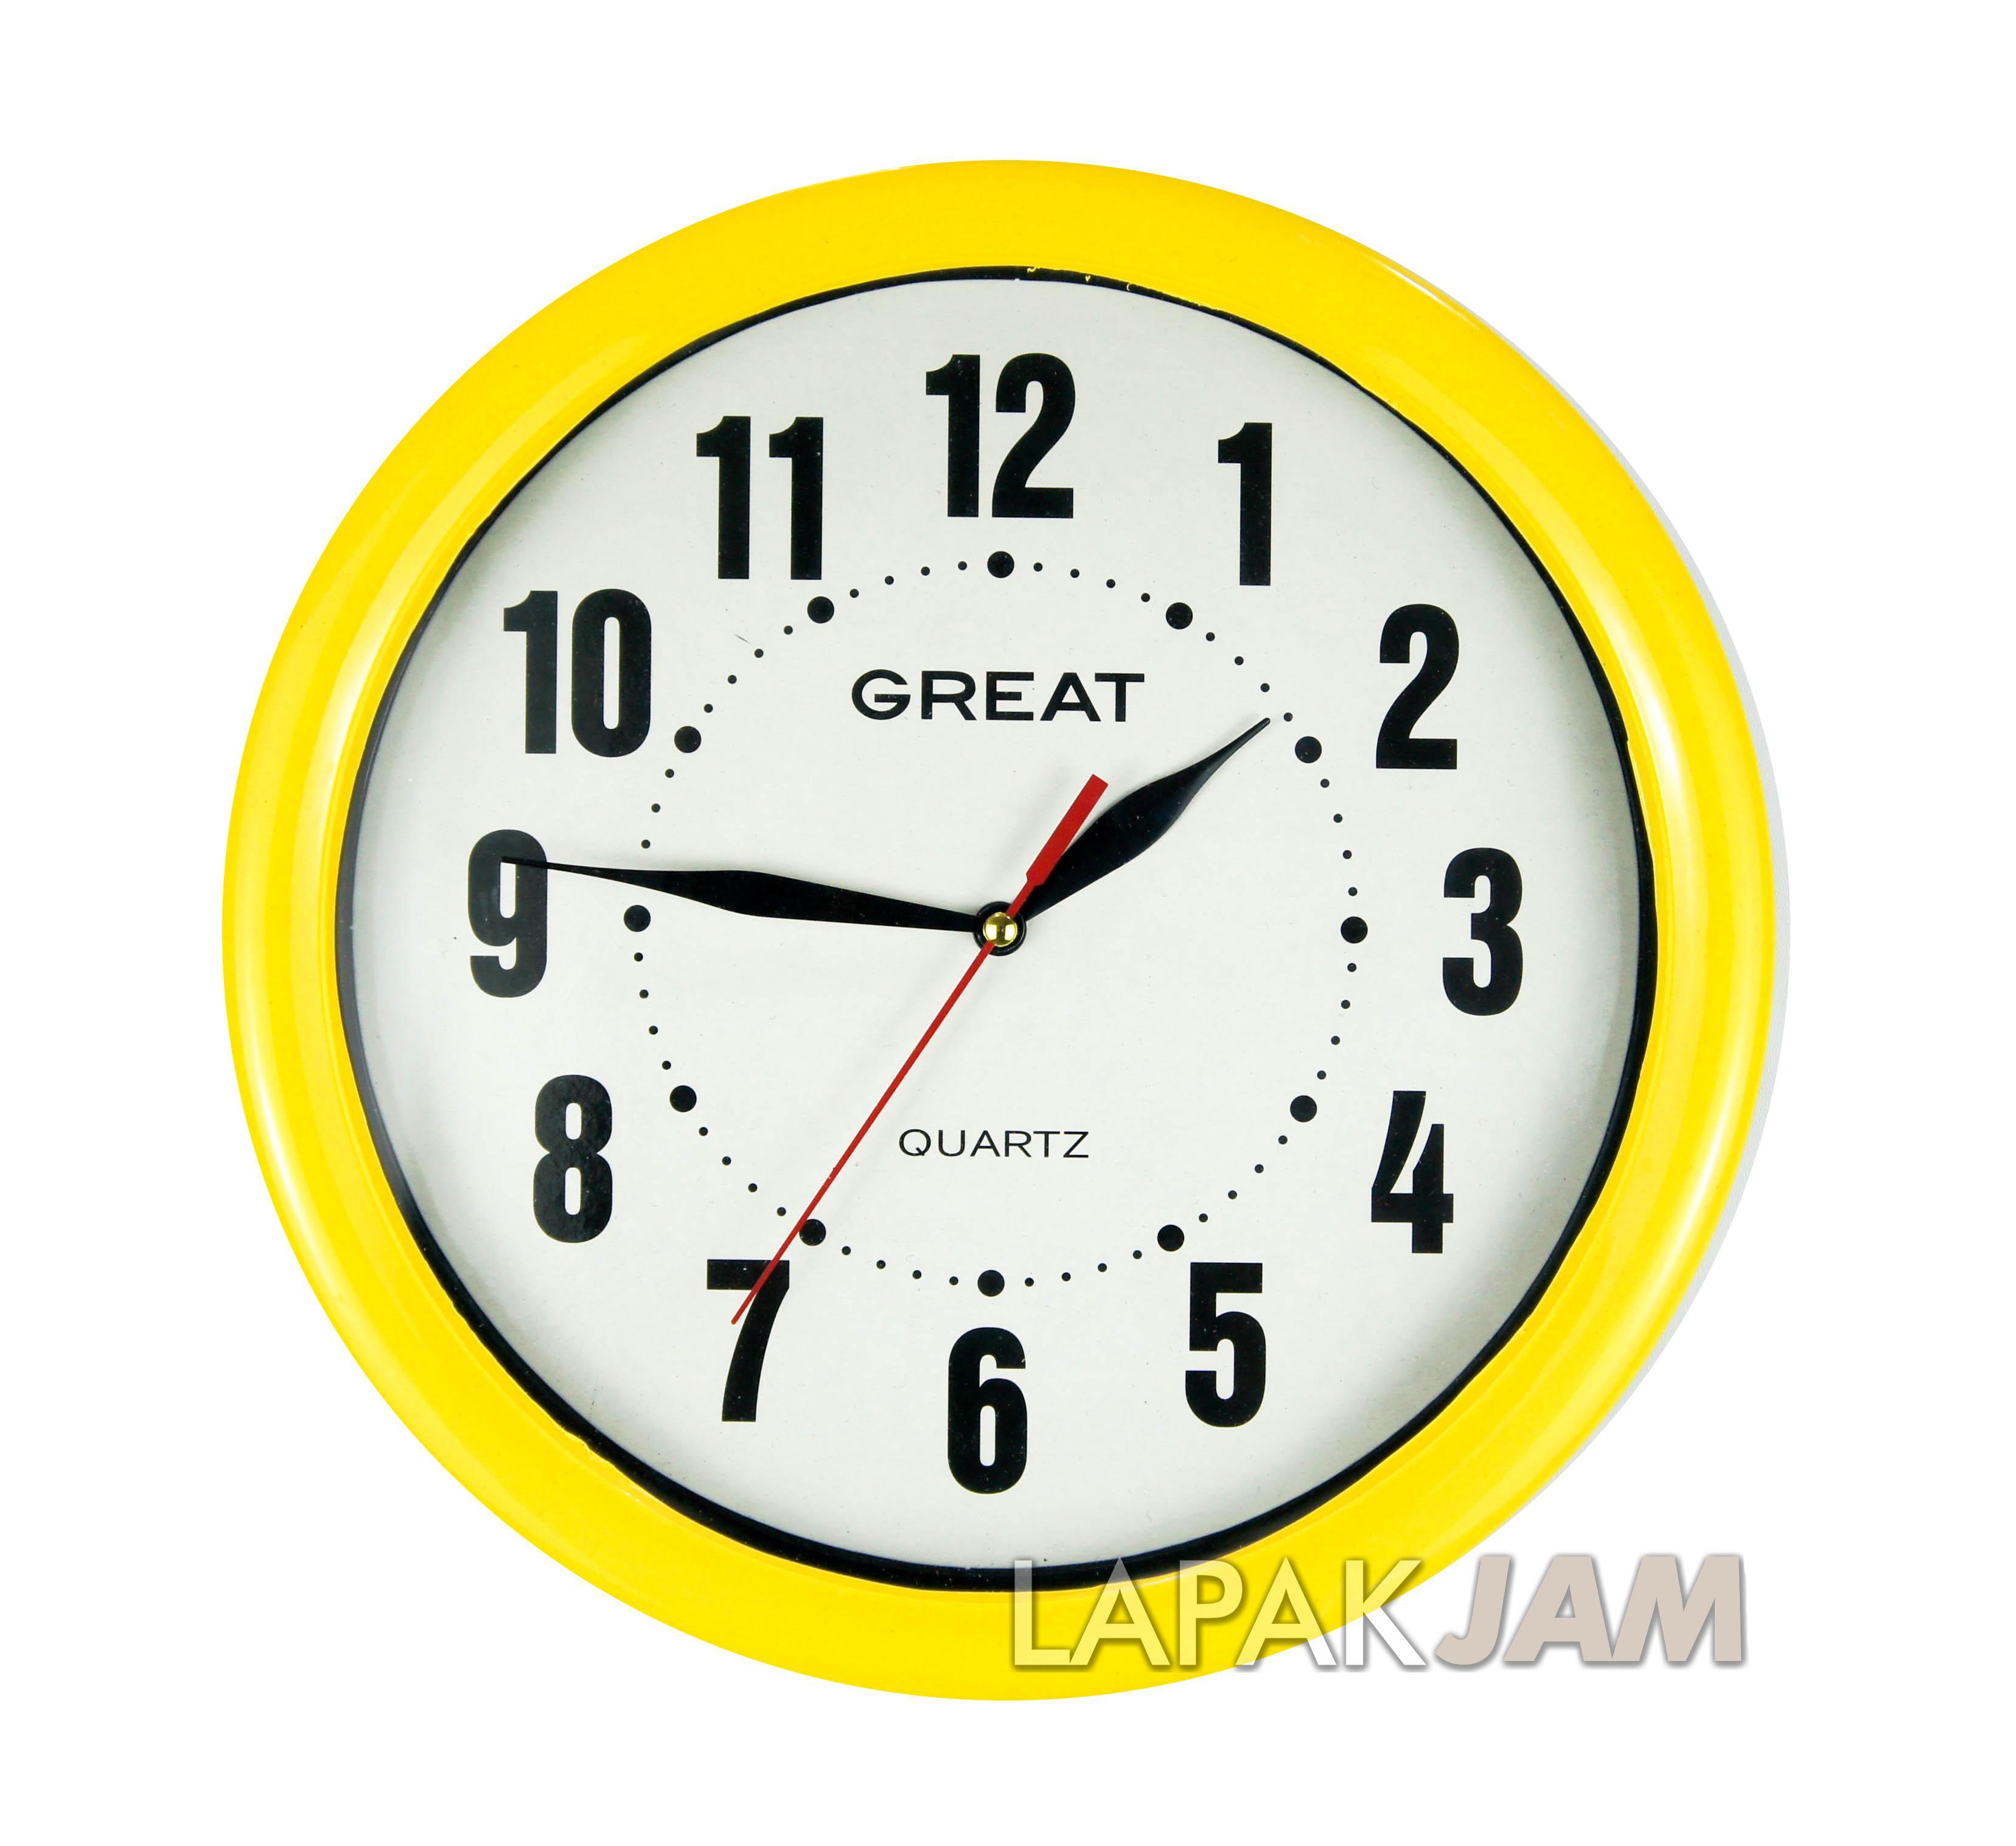 Jam Dinding Great 777 Warna Putih Hitam Merah Biru Kuning Hijau Diameter 28 Cm Best Seller By Lapakjam.